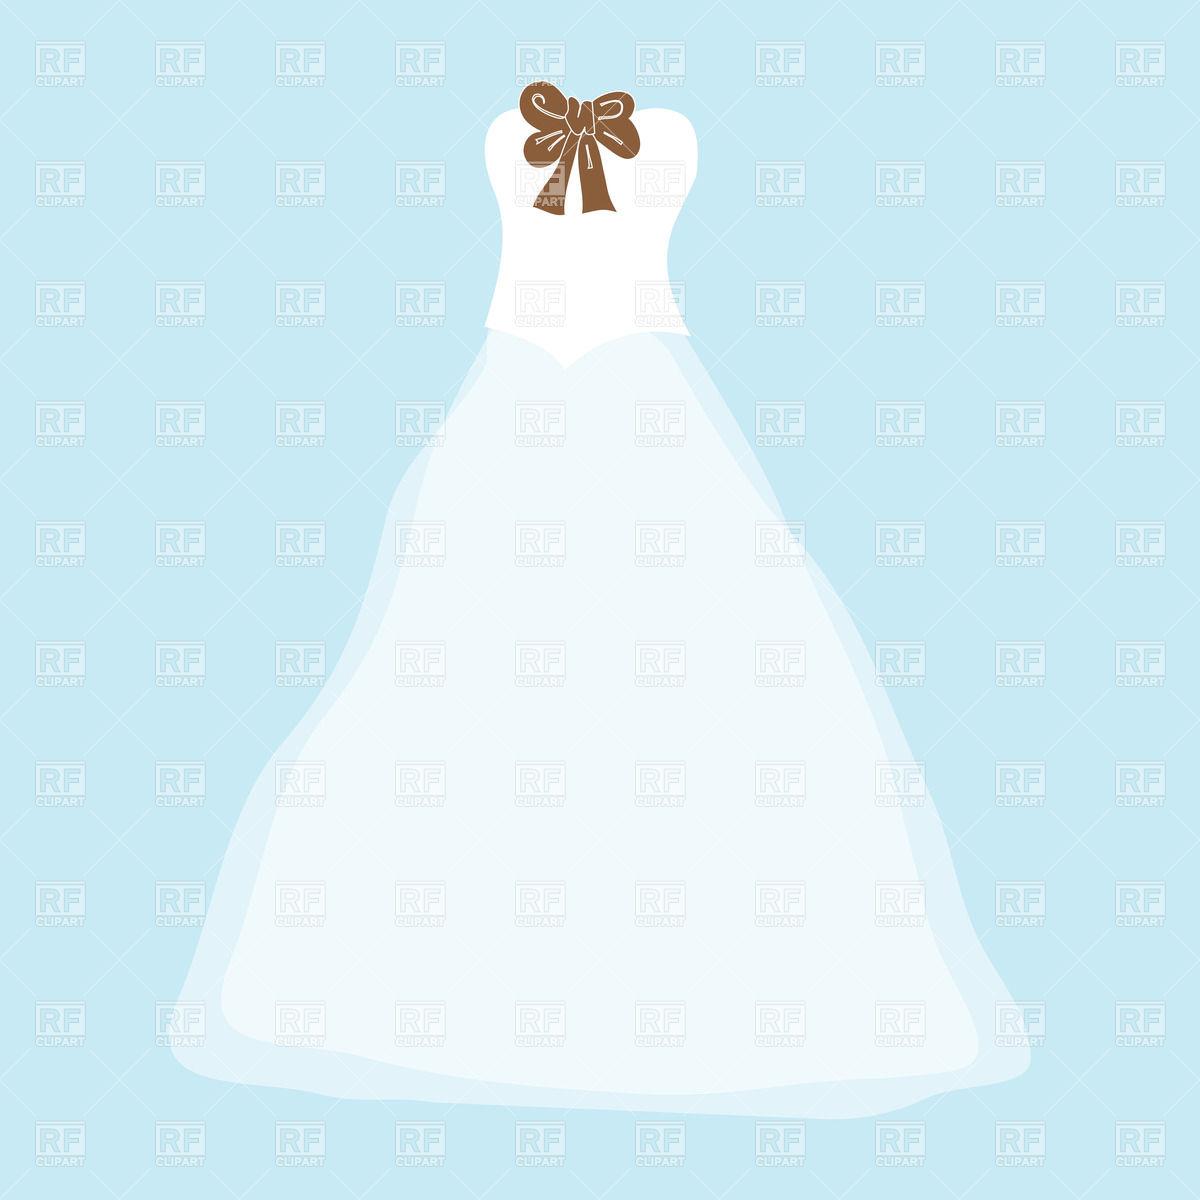 Clipart wedding dress clipart jpg library stock Clipart wedding dress clipart - ClipartFest jpg library stock